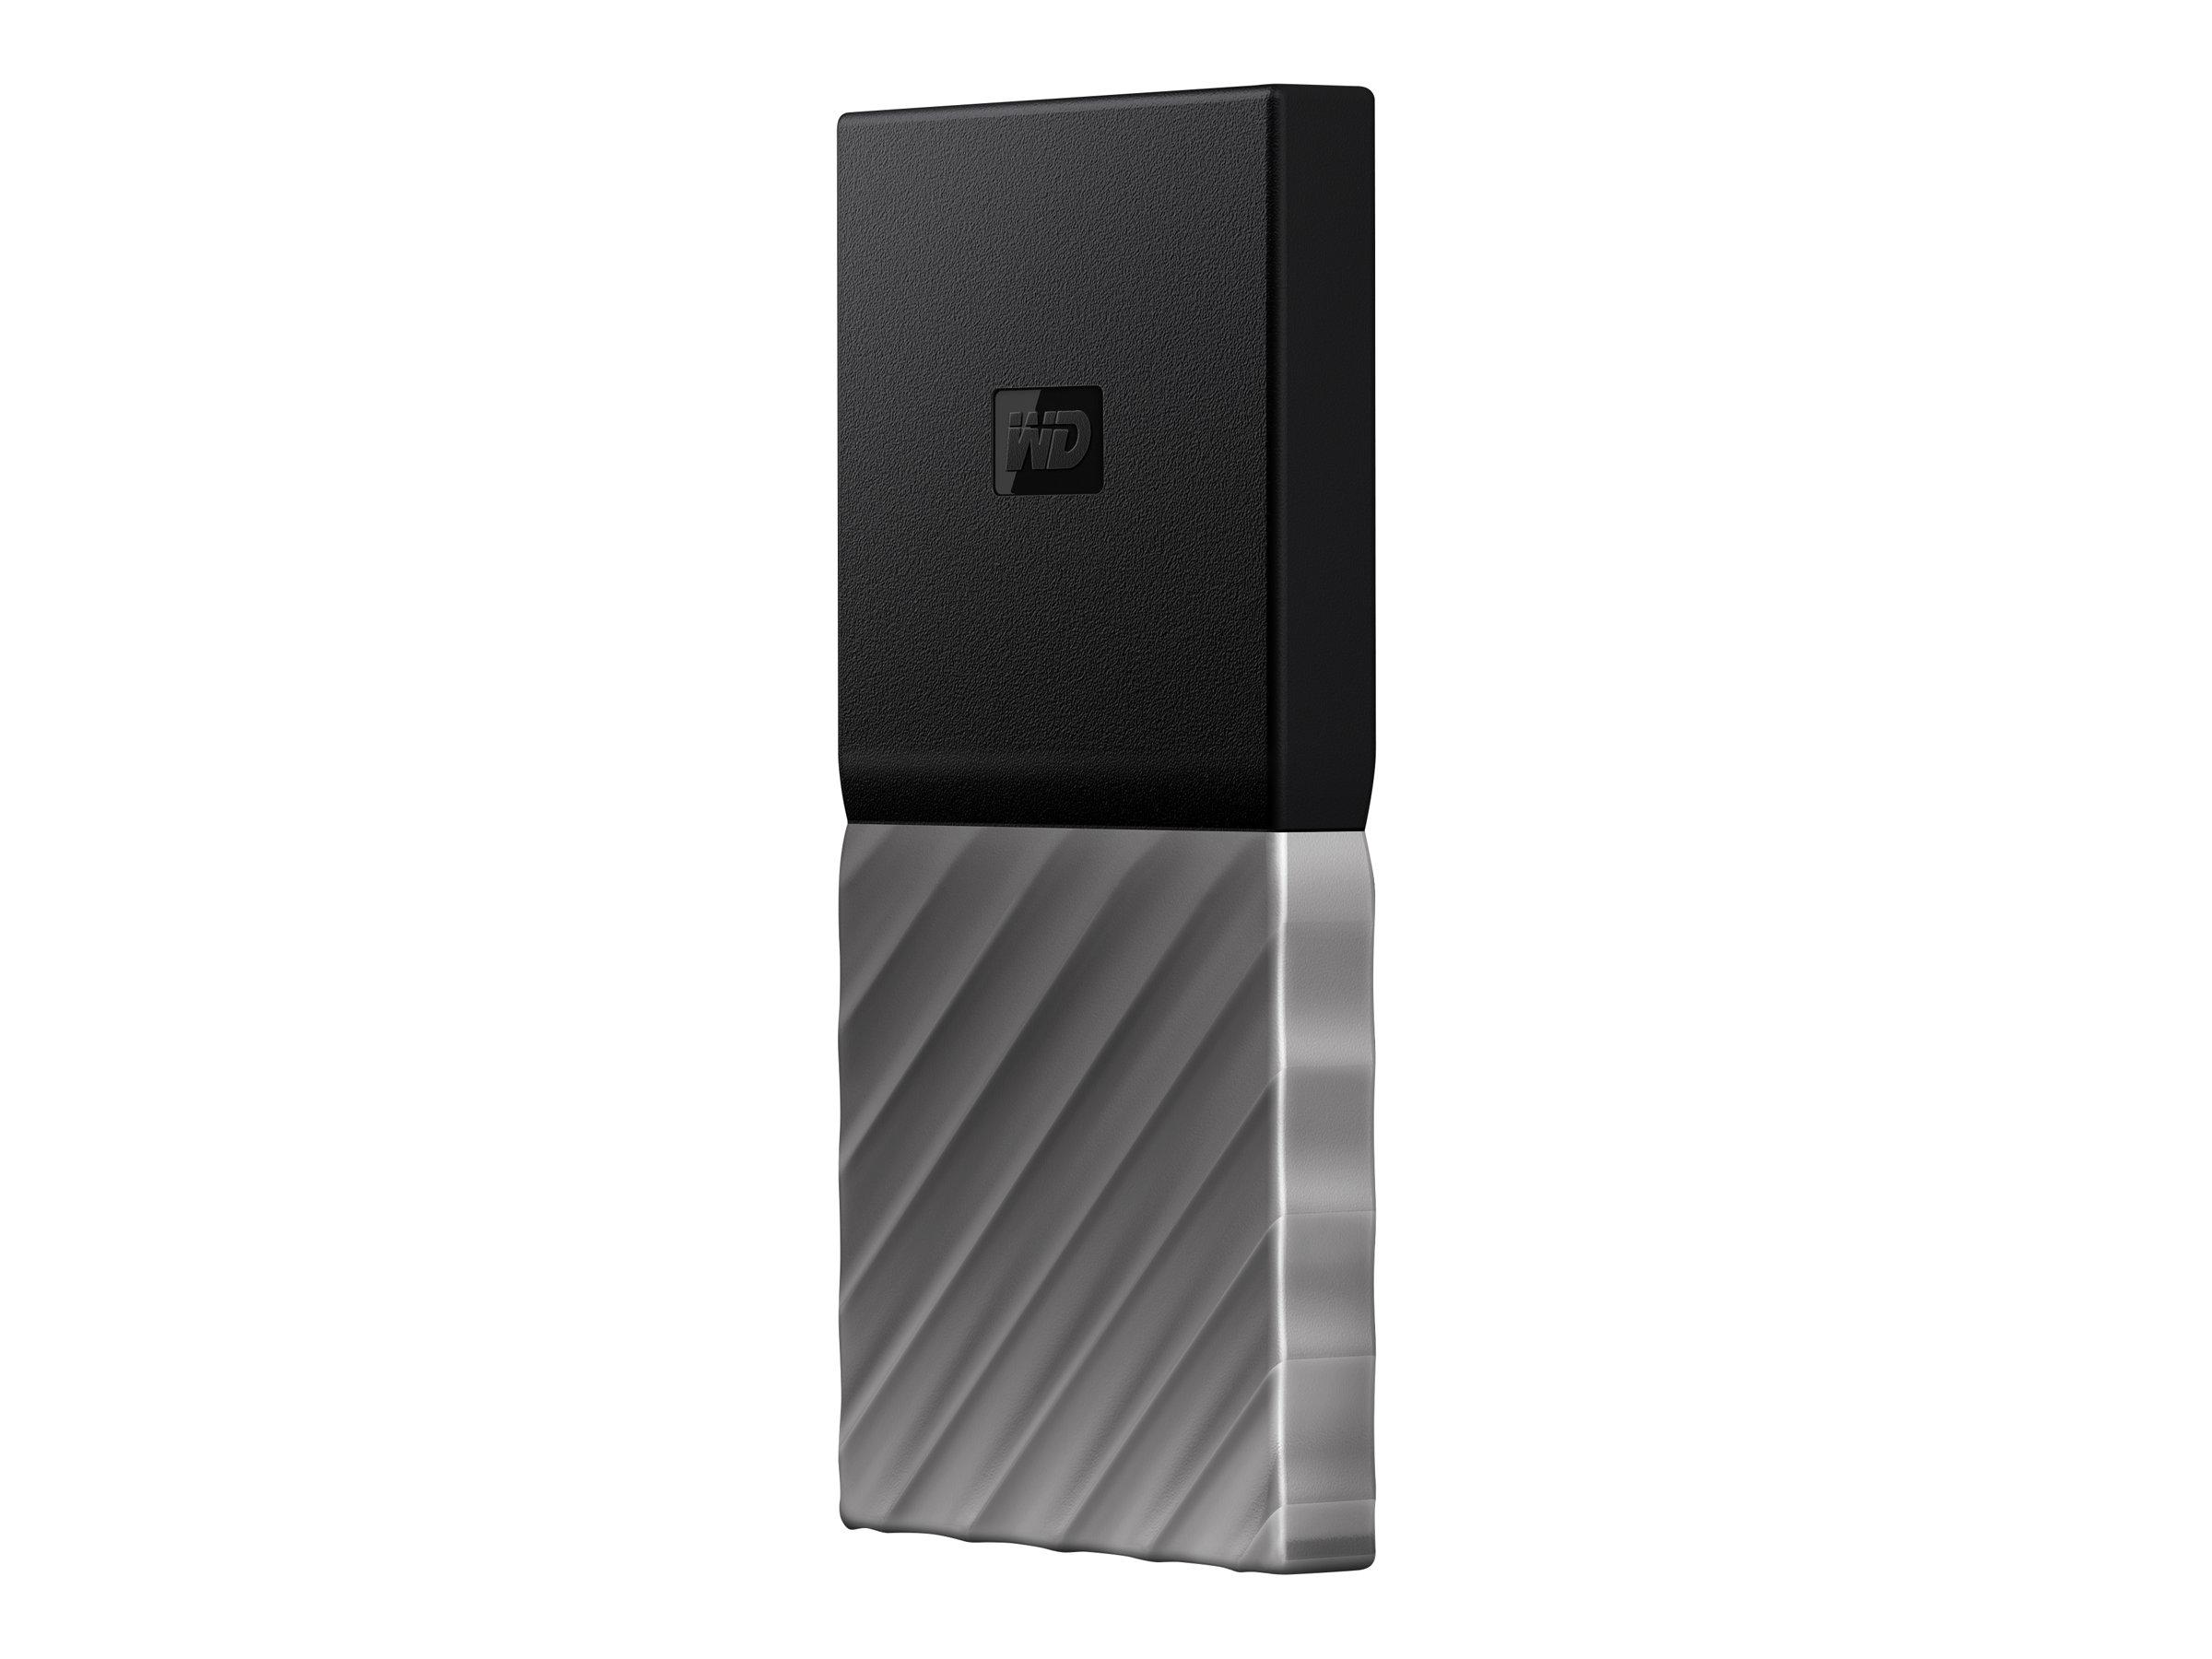 WD My Passport SSD WDBK3E5120PSL - Solid-State-Disk - verschlüsselt - 512 GB - extern (tragbar) - USB 3.1 Gen 2 (USB-C Steckverb